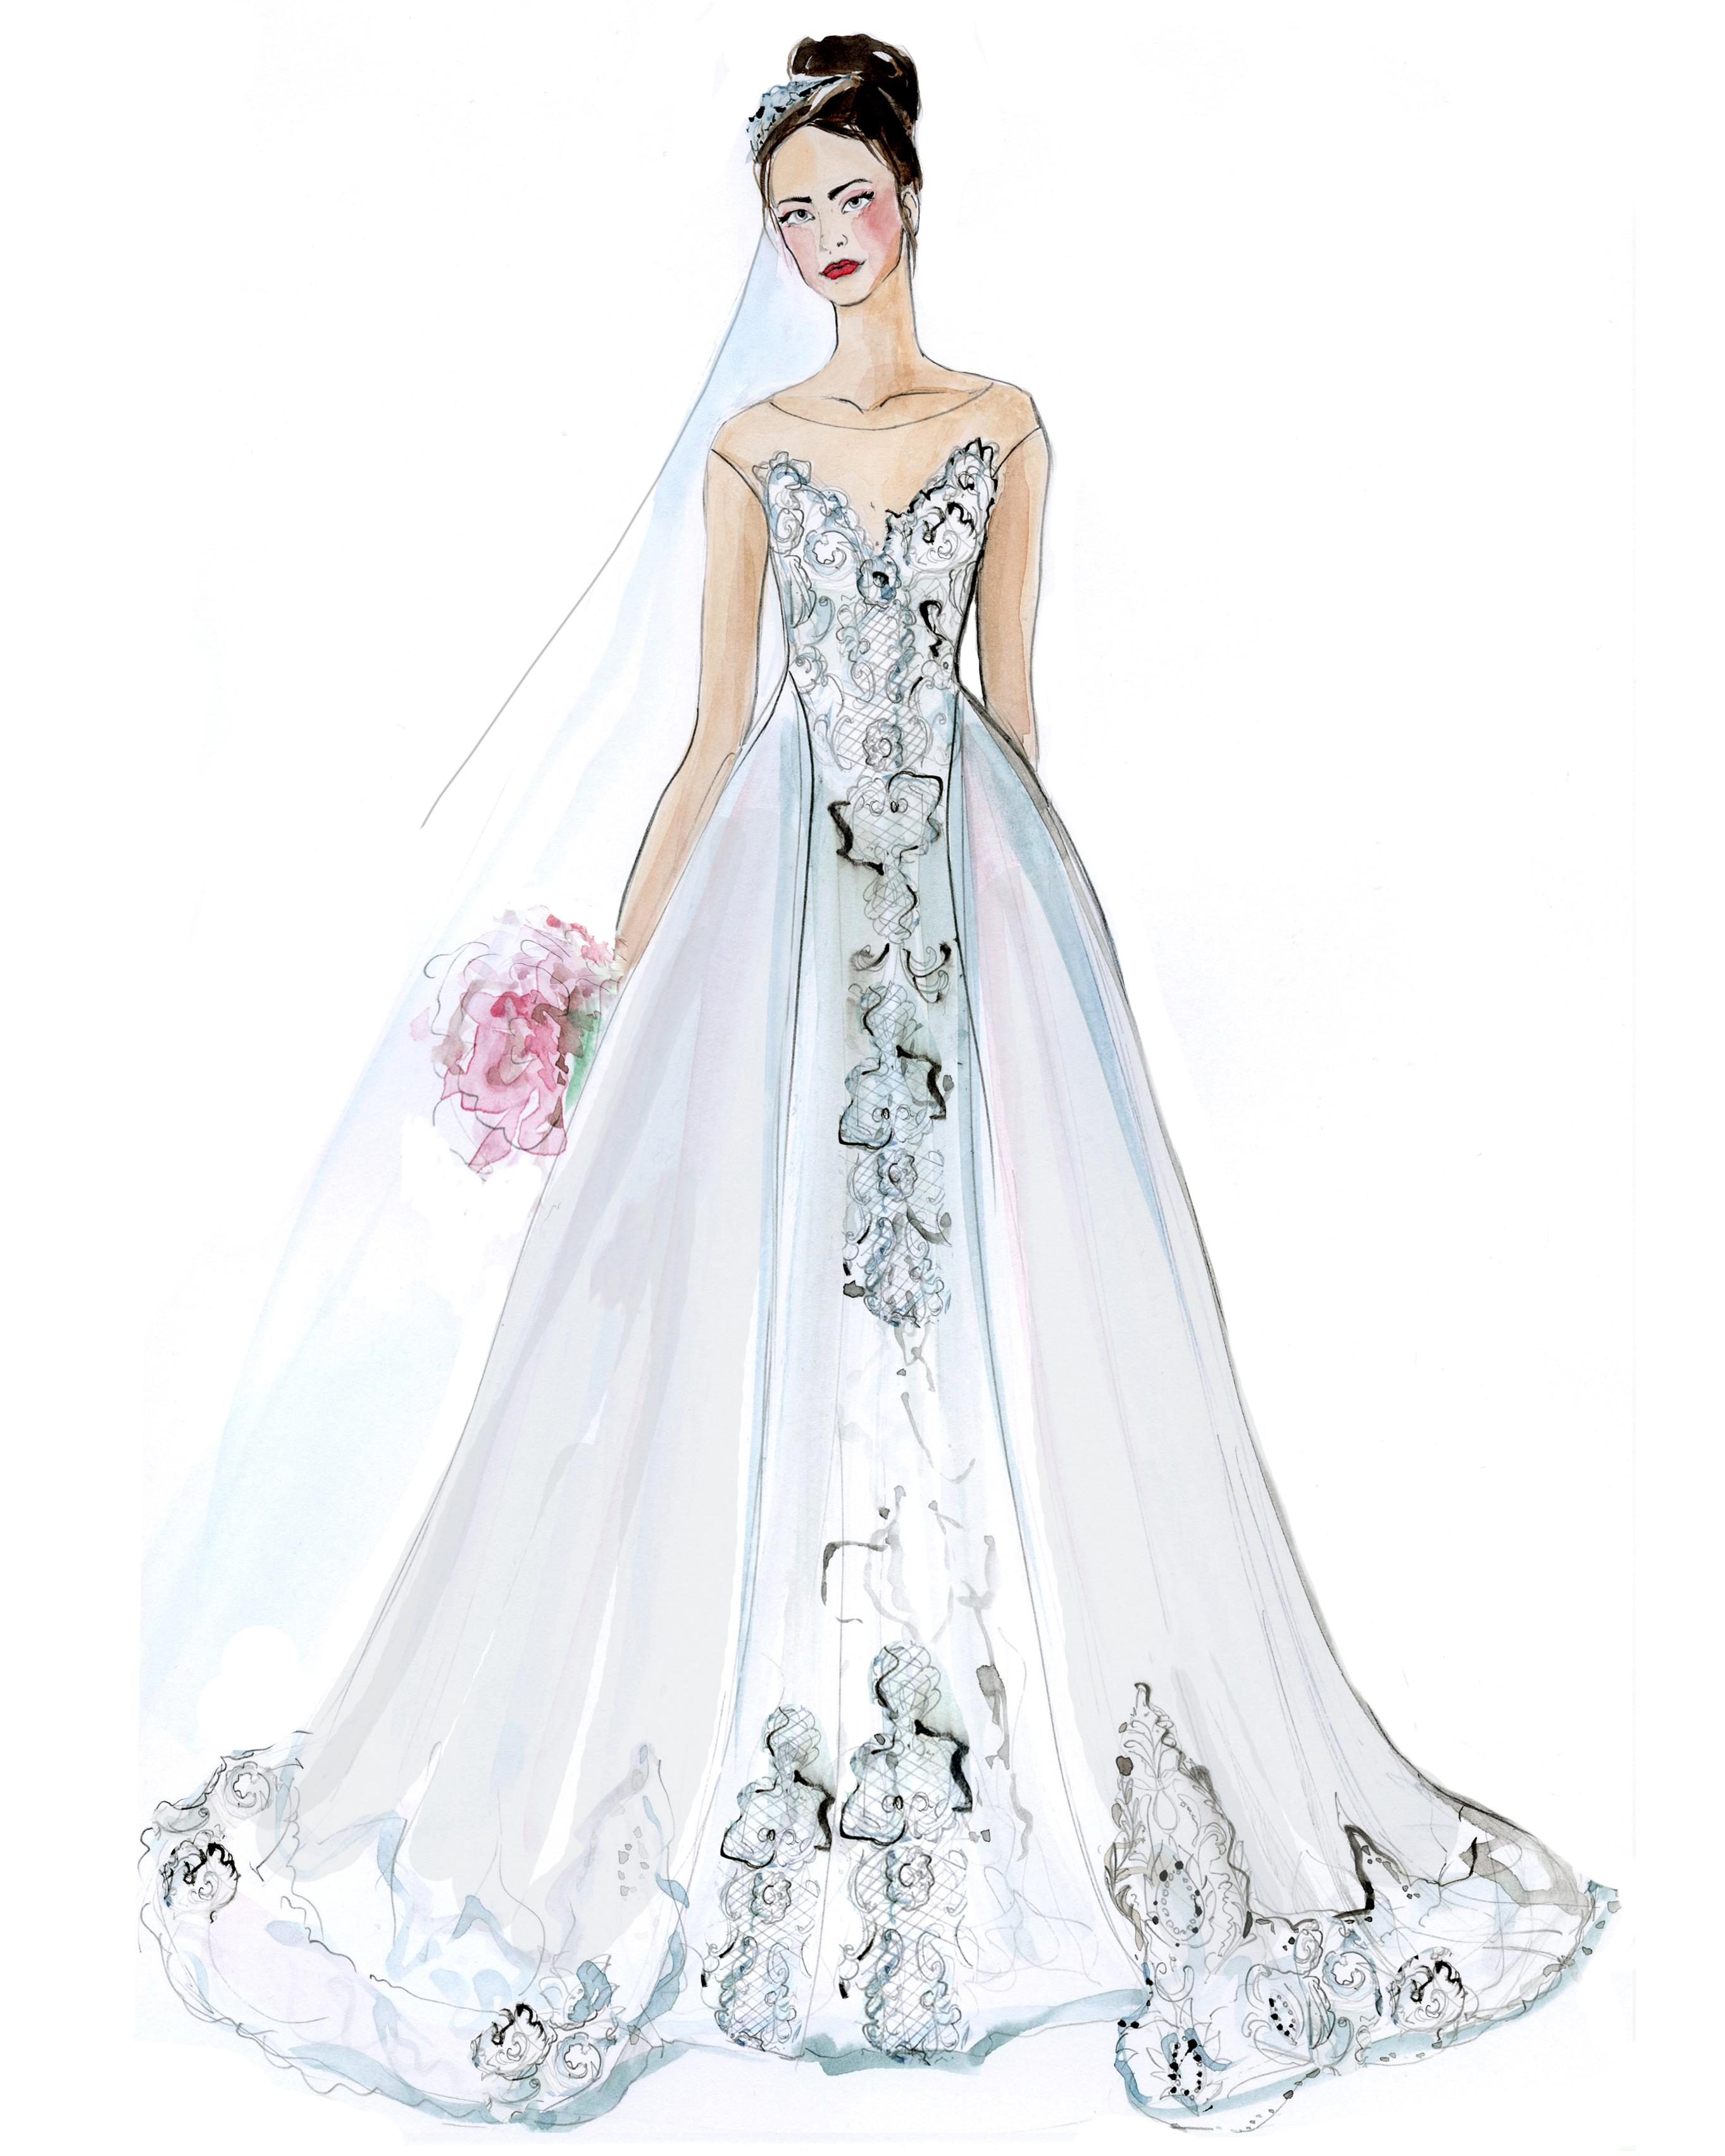 olvis wedding dress sketch